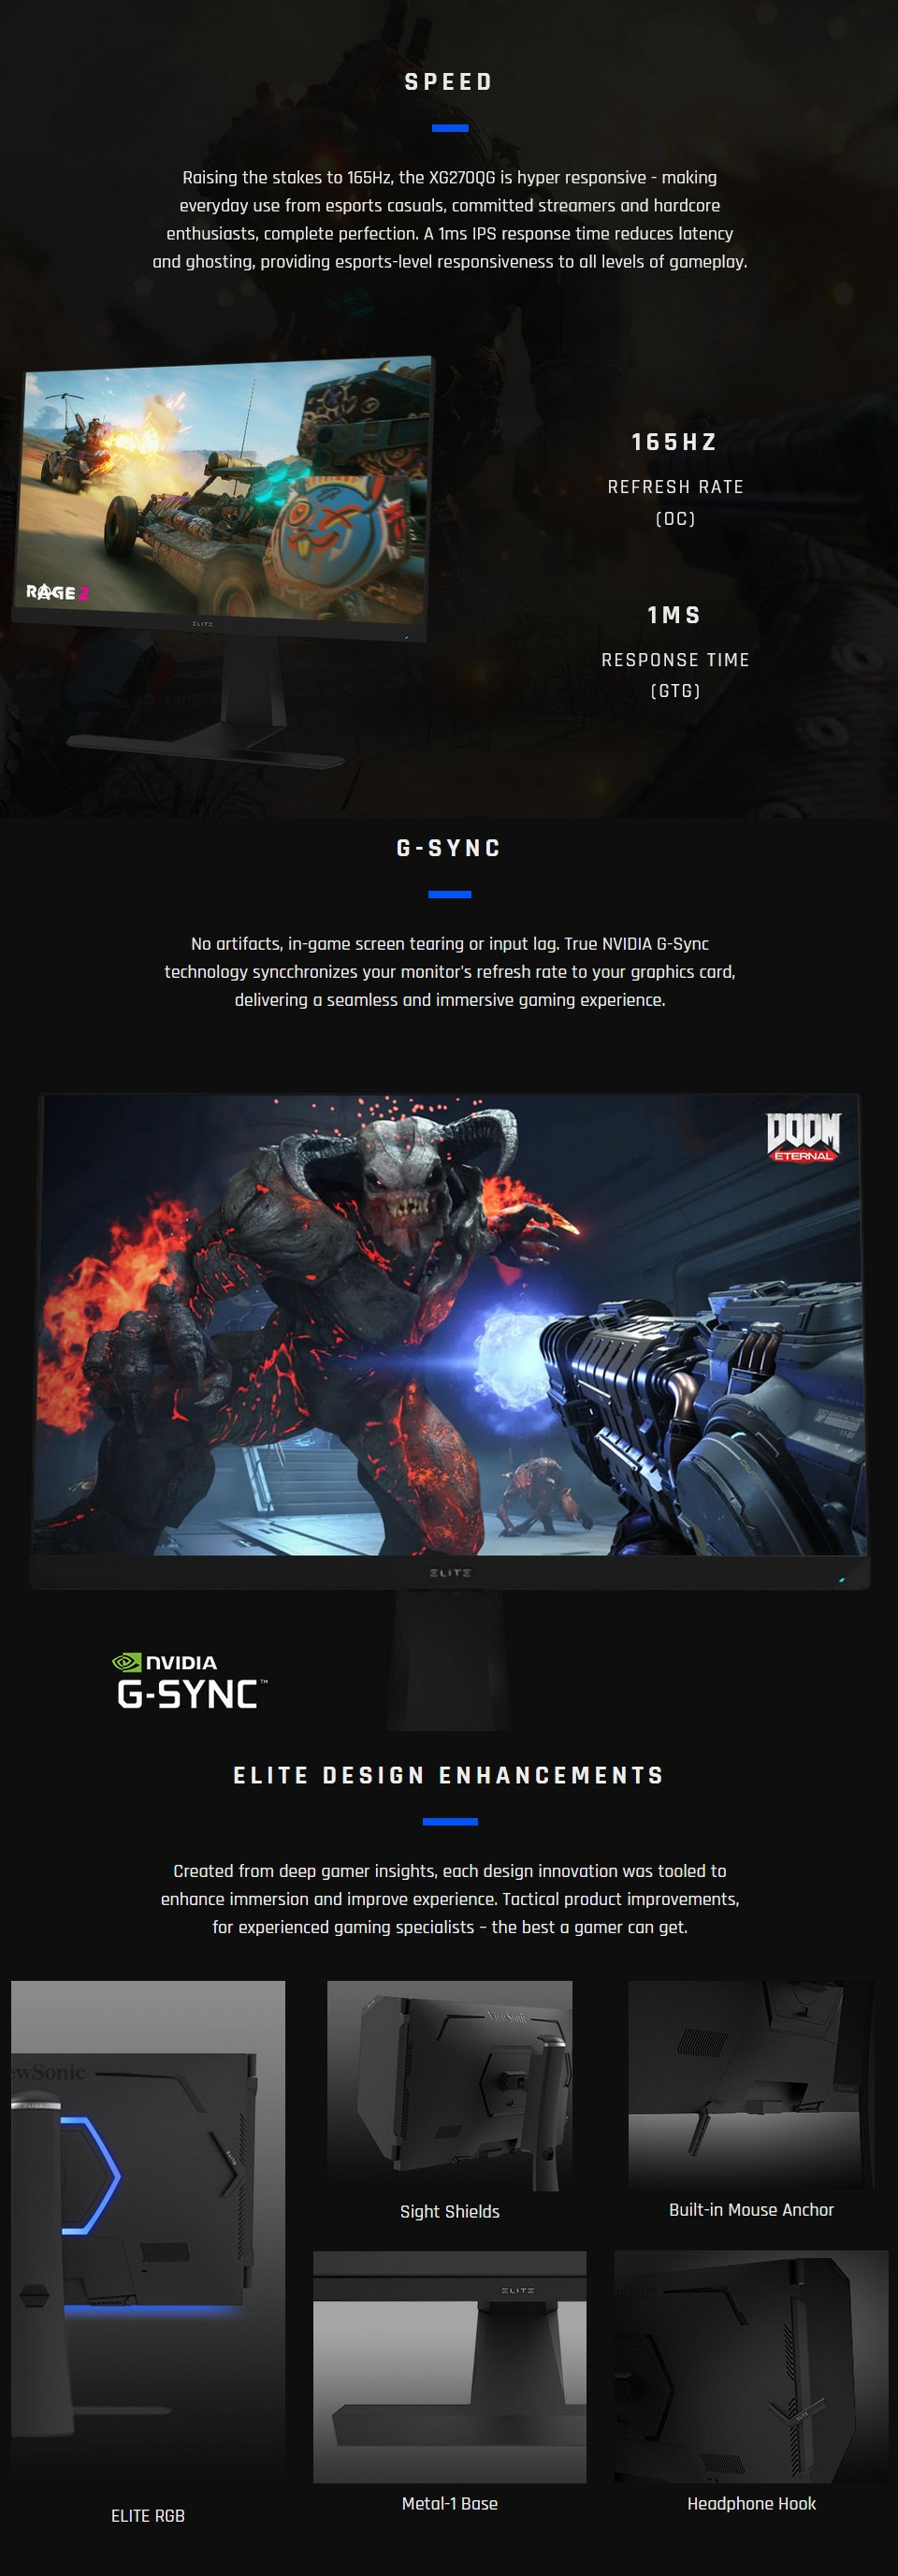 ViewSonic Elite XG270QG WQHD 165Hz G-Sync IPS 27in Monitor features 2